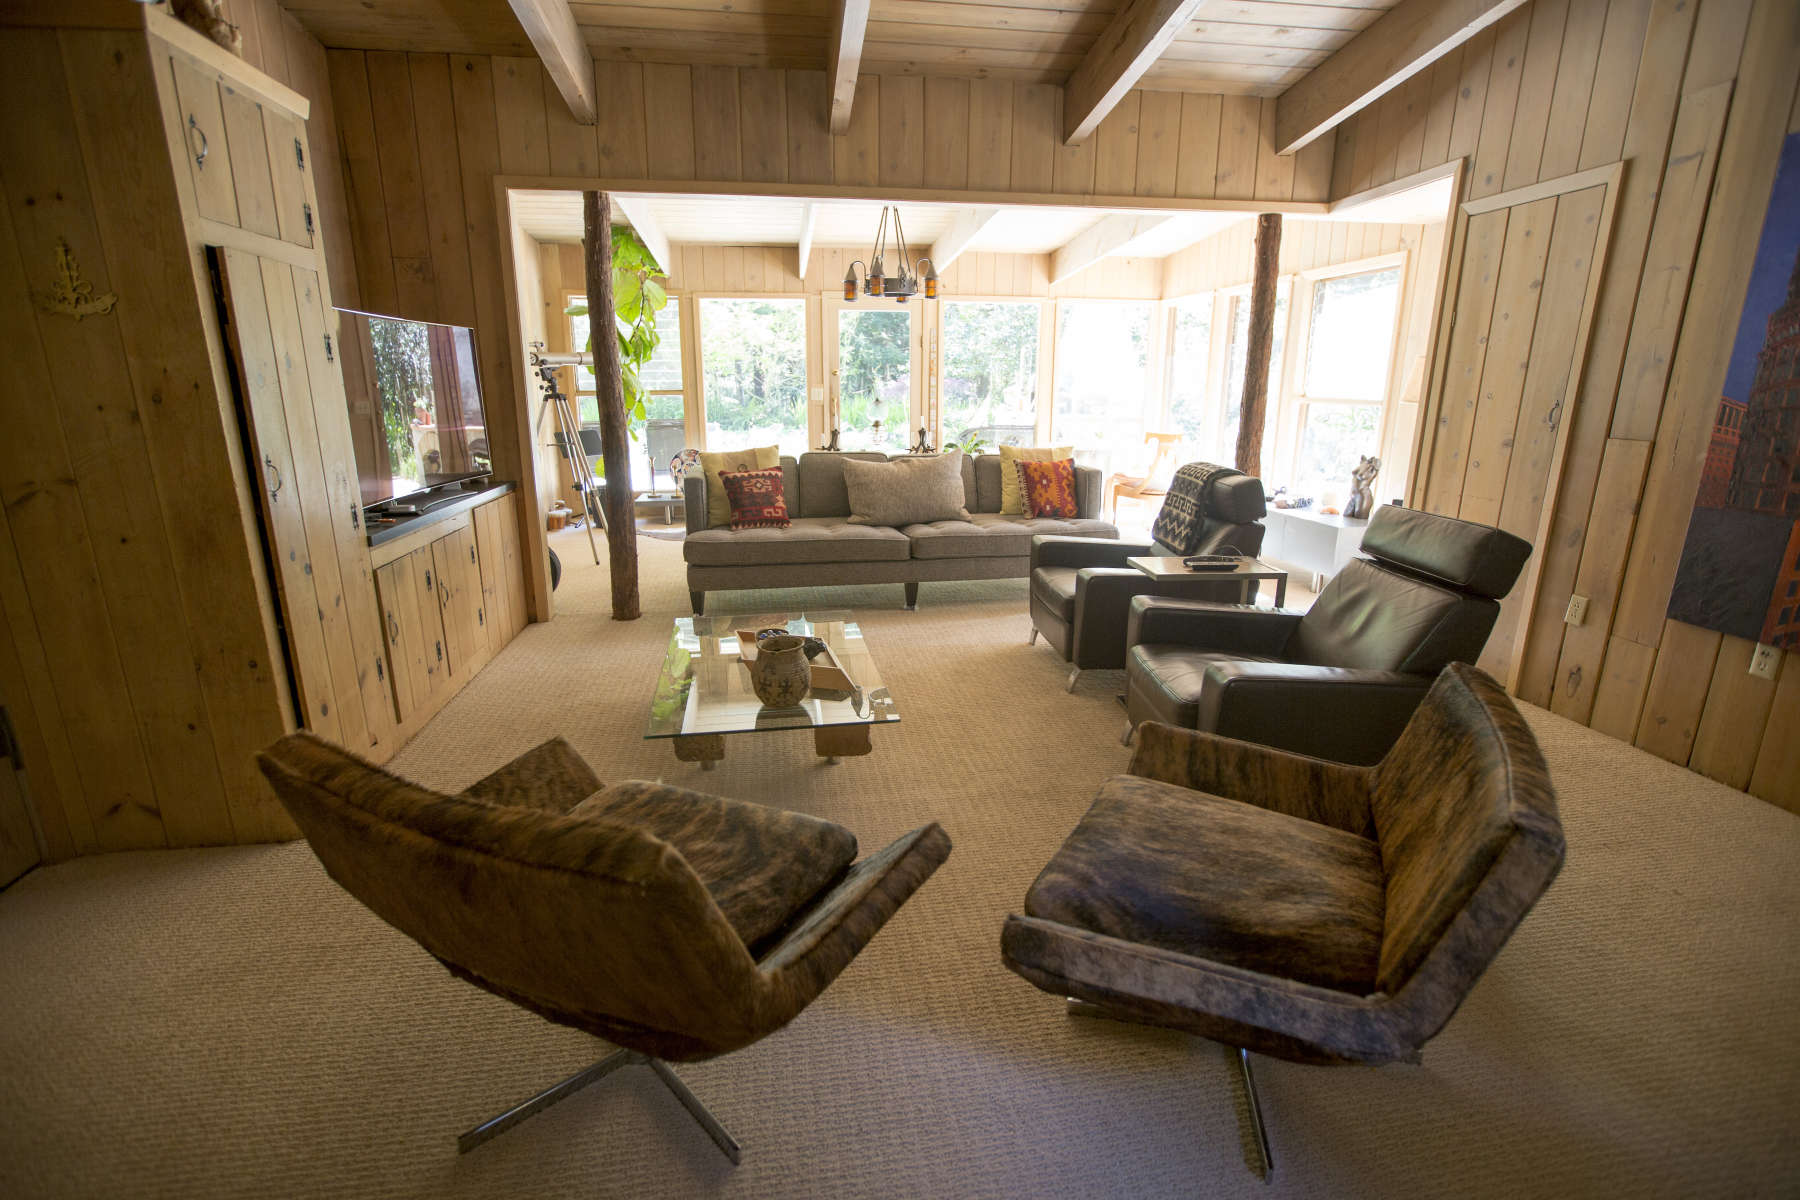 cowboy living room.  Karen G s photo at The Cowboy Room Flip Jack Ranch CA 13 Hipcamper reviews and 59